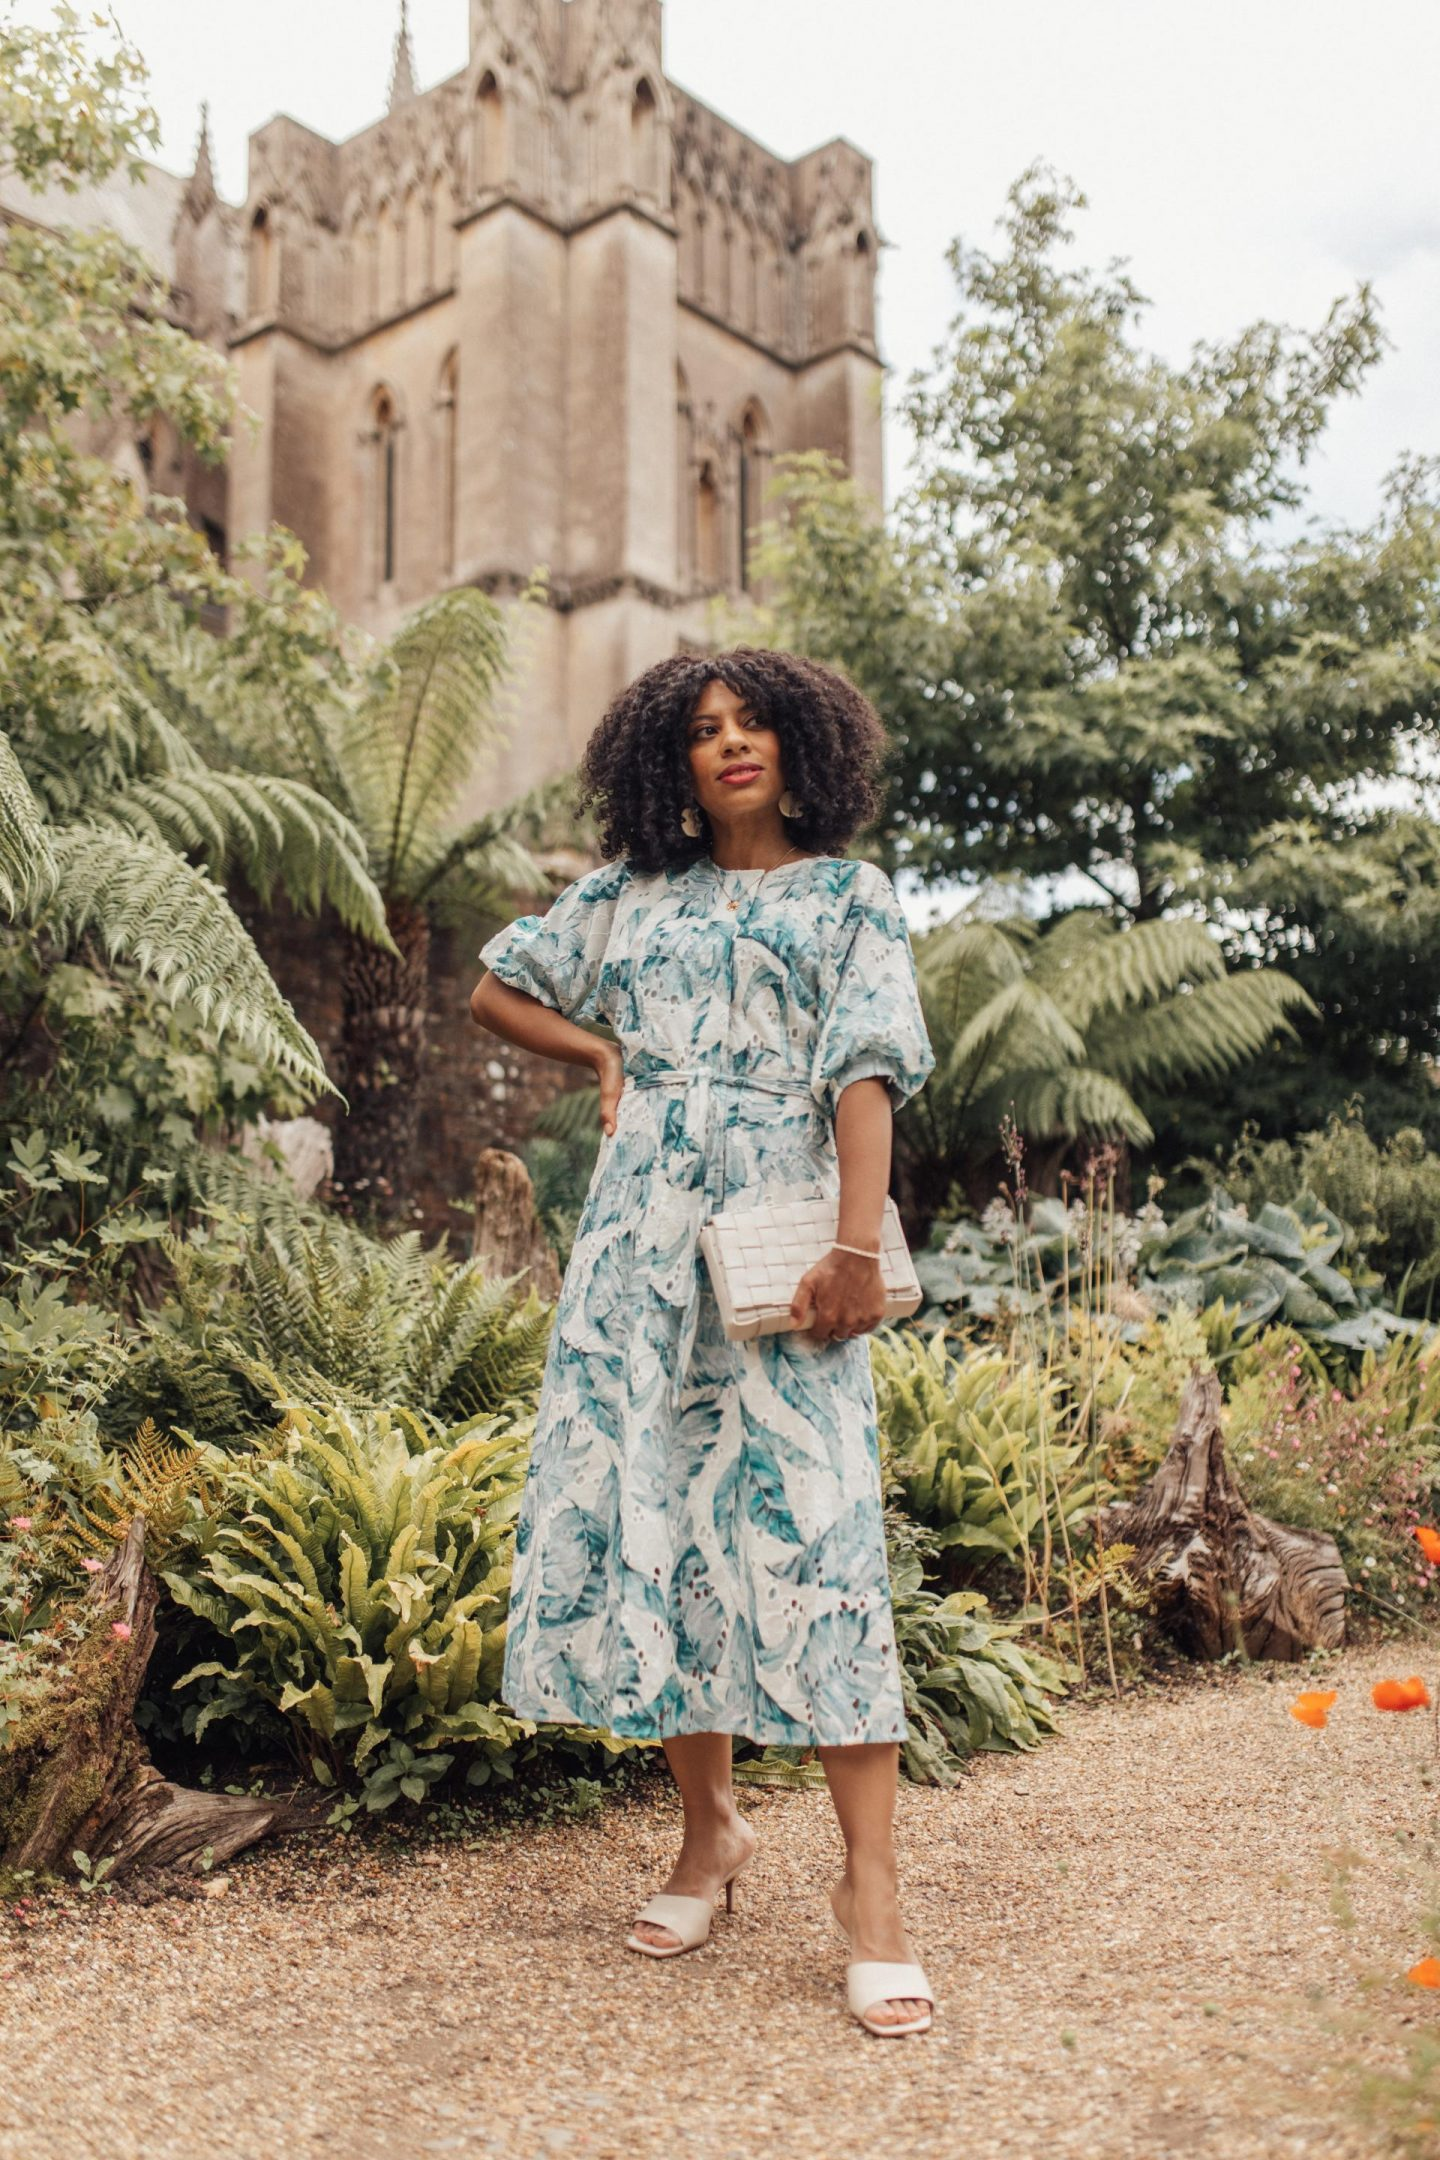 EleanorBarkes.com - 5 Wedding Guest Outfits